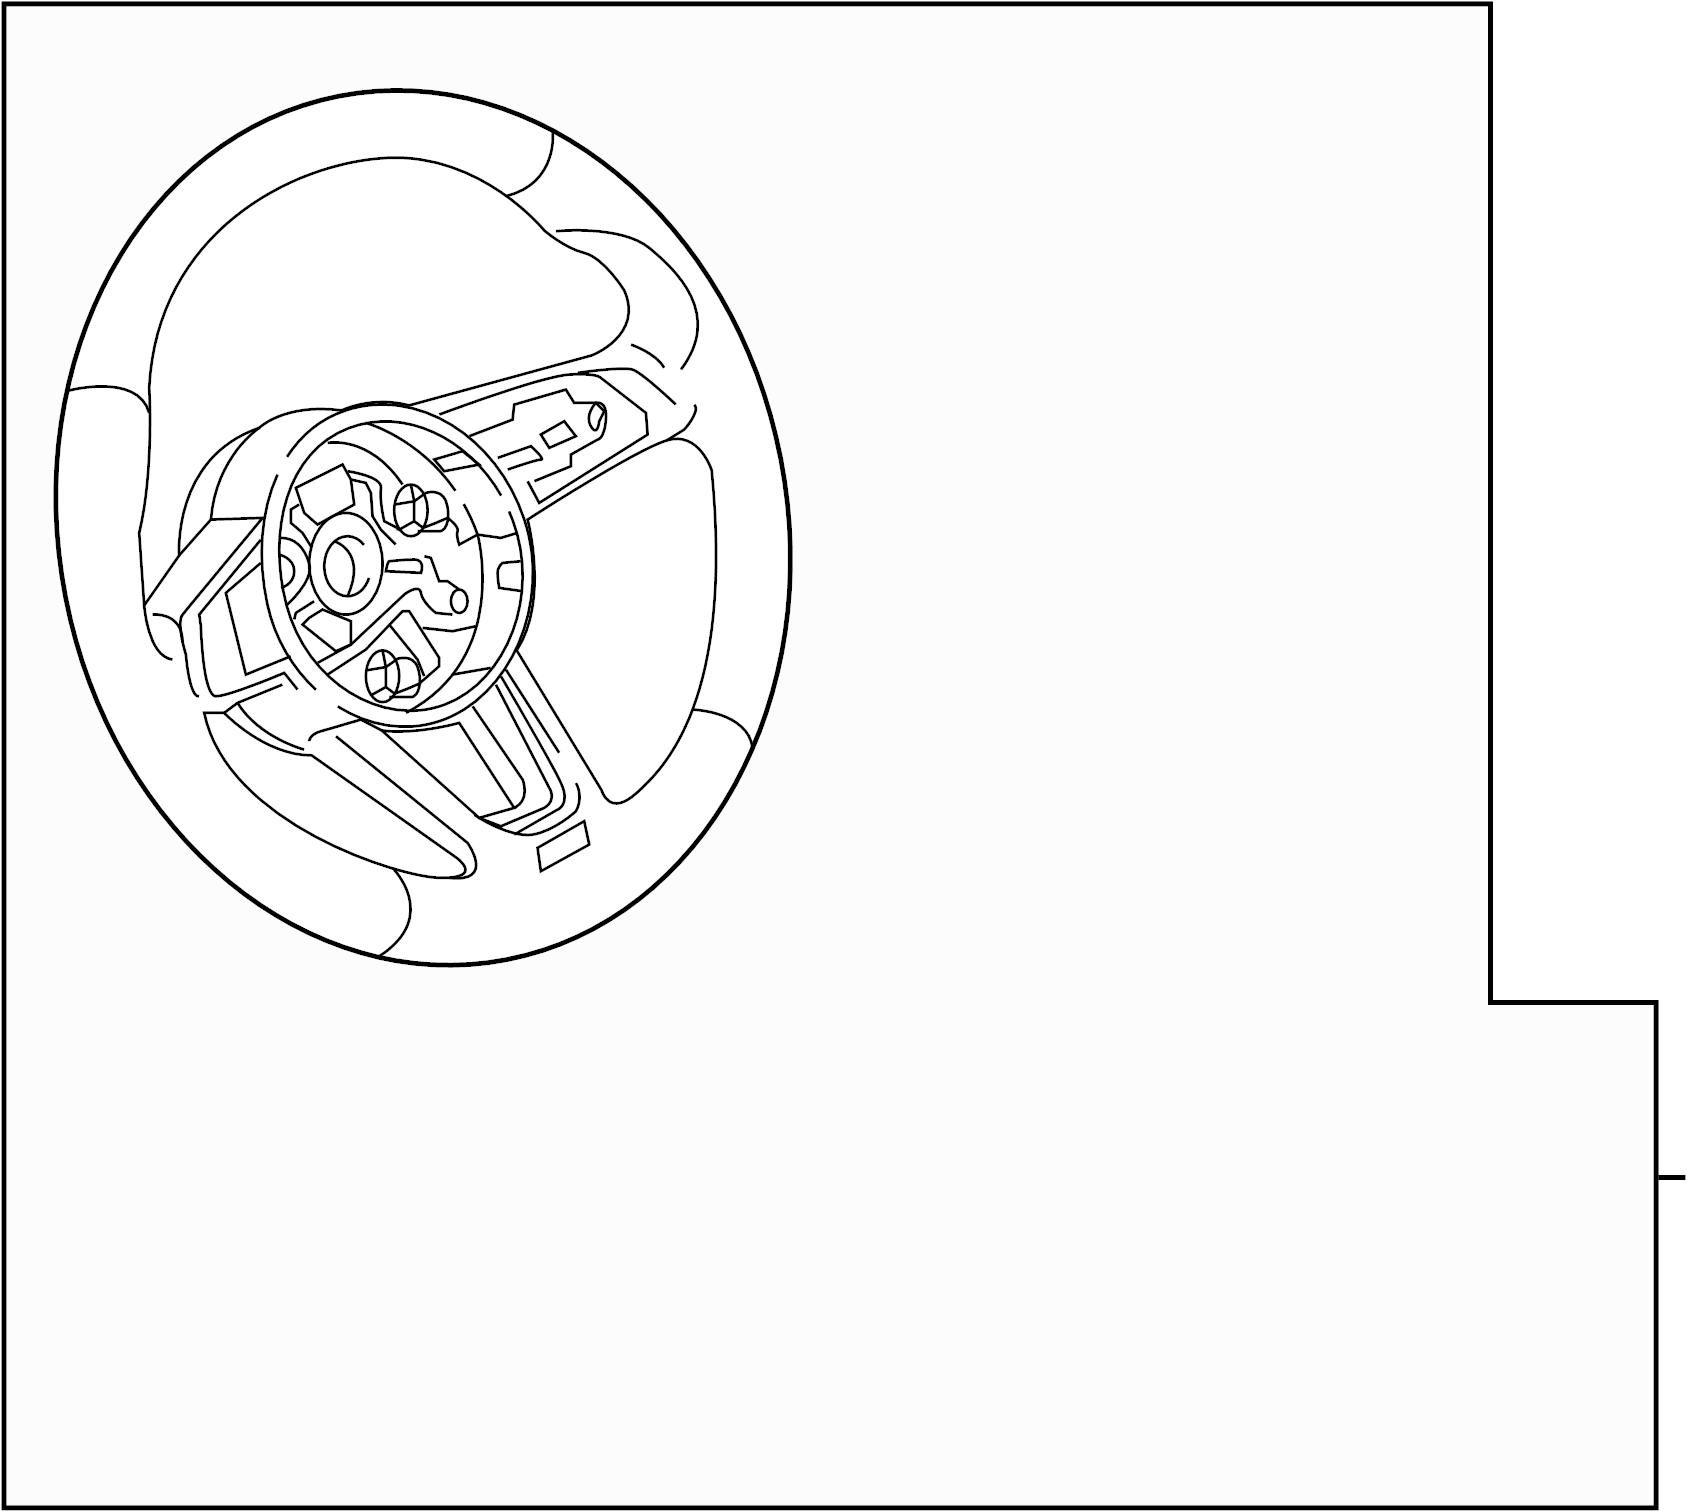 2017 Audi A4 Steering Wheel. W/O FLAT BOTTOM, w/heated